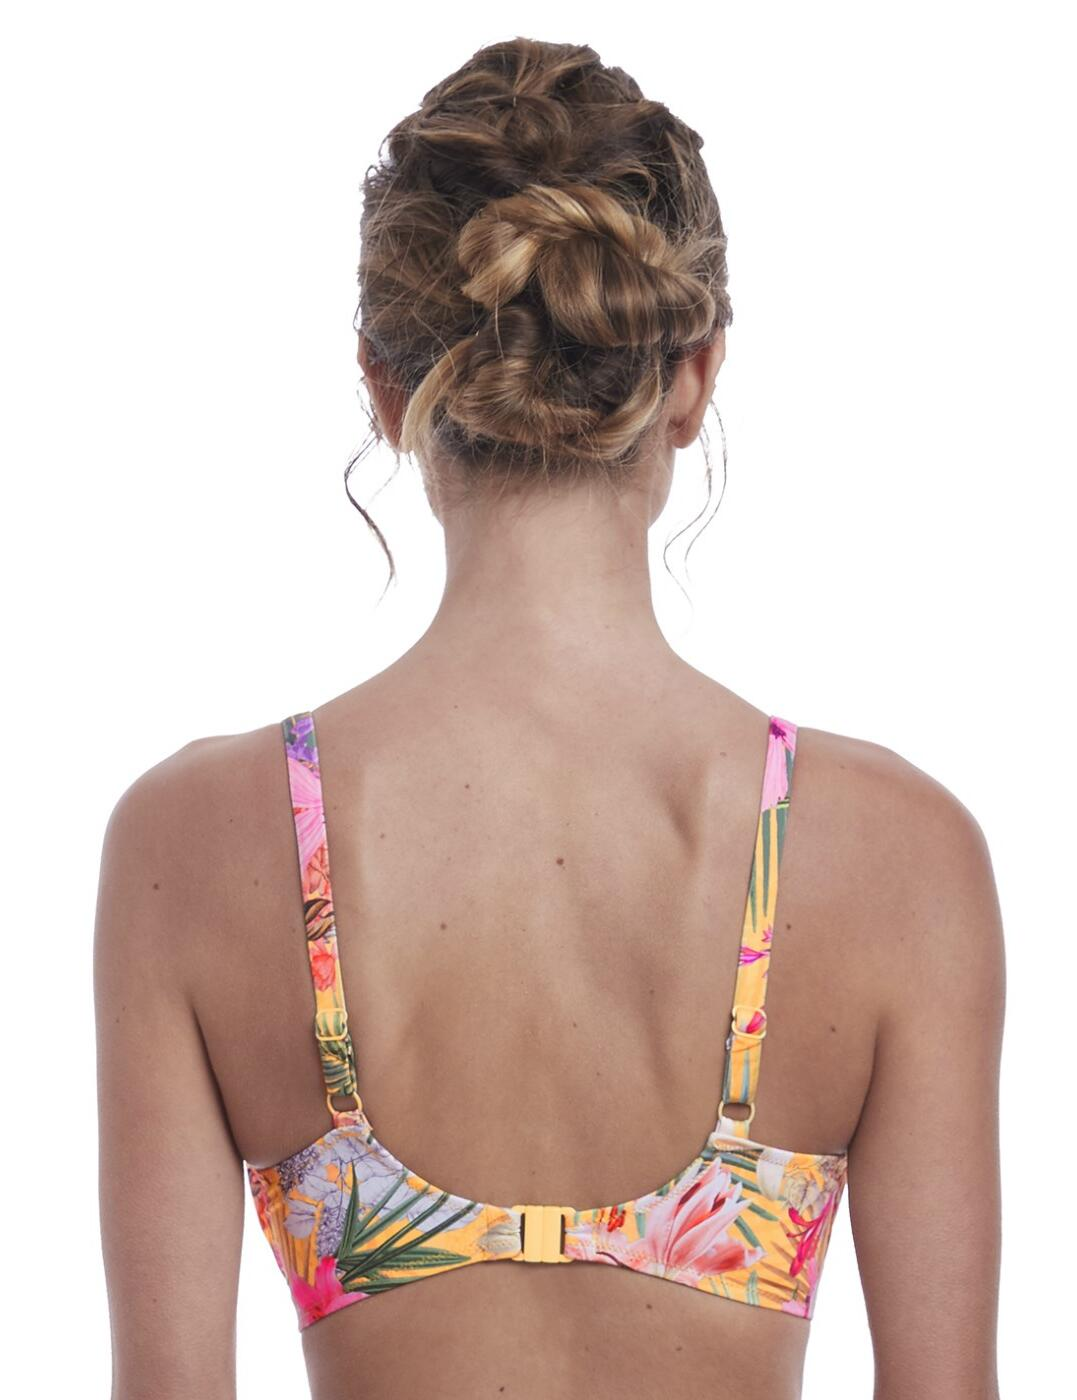 Fantasie Anguilla Gathered Full Cup Bikini Top 6580 Womens Underwired Swimwear